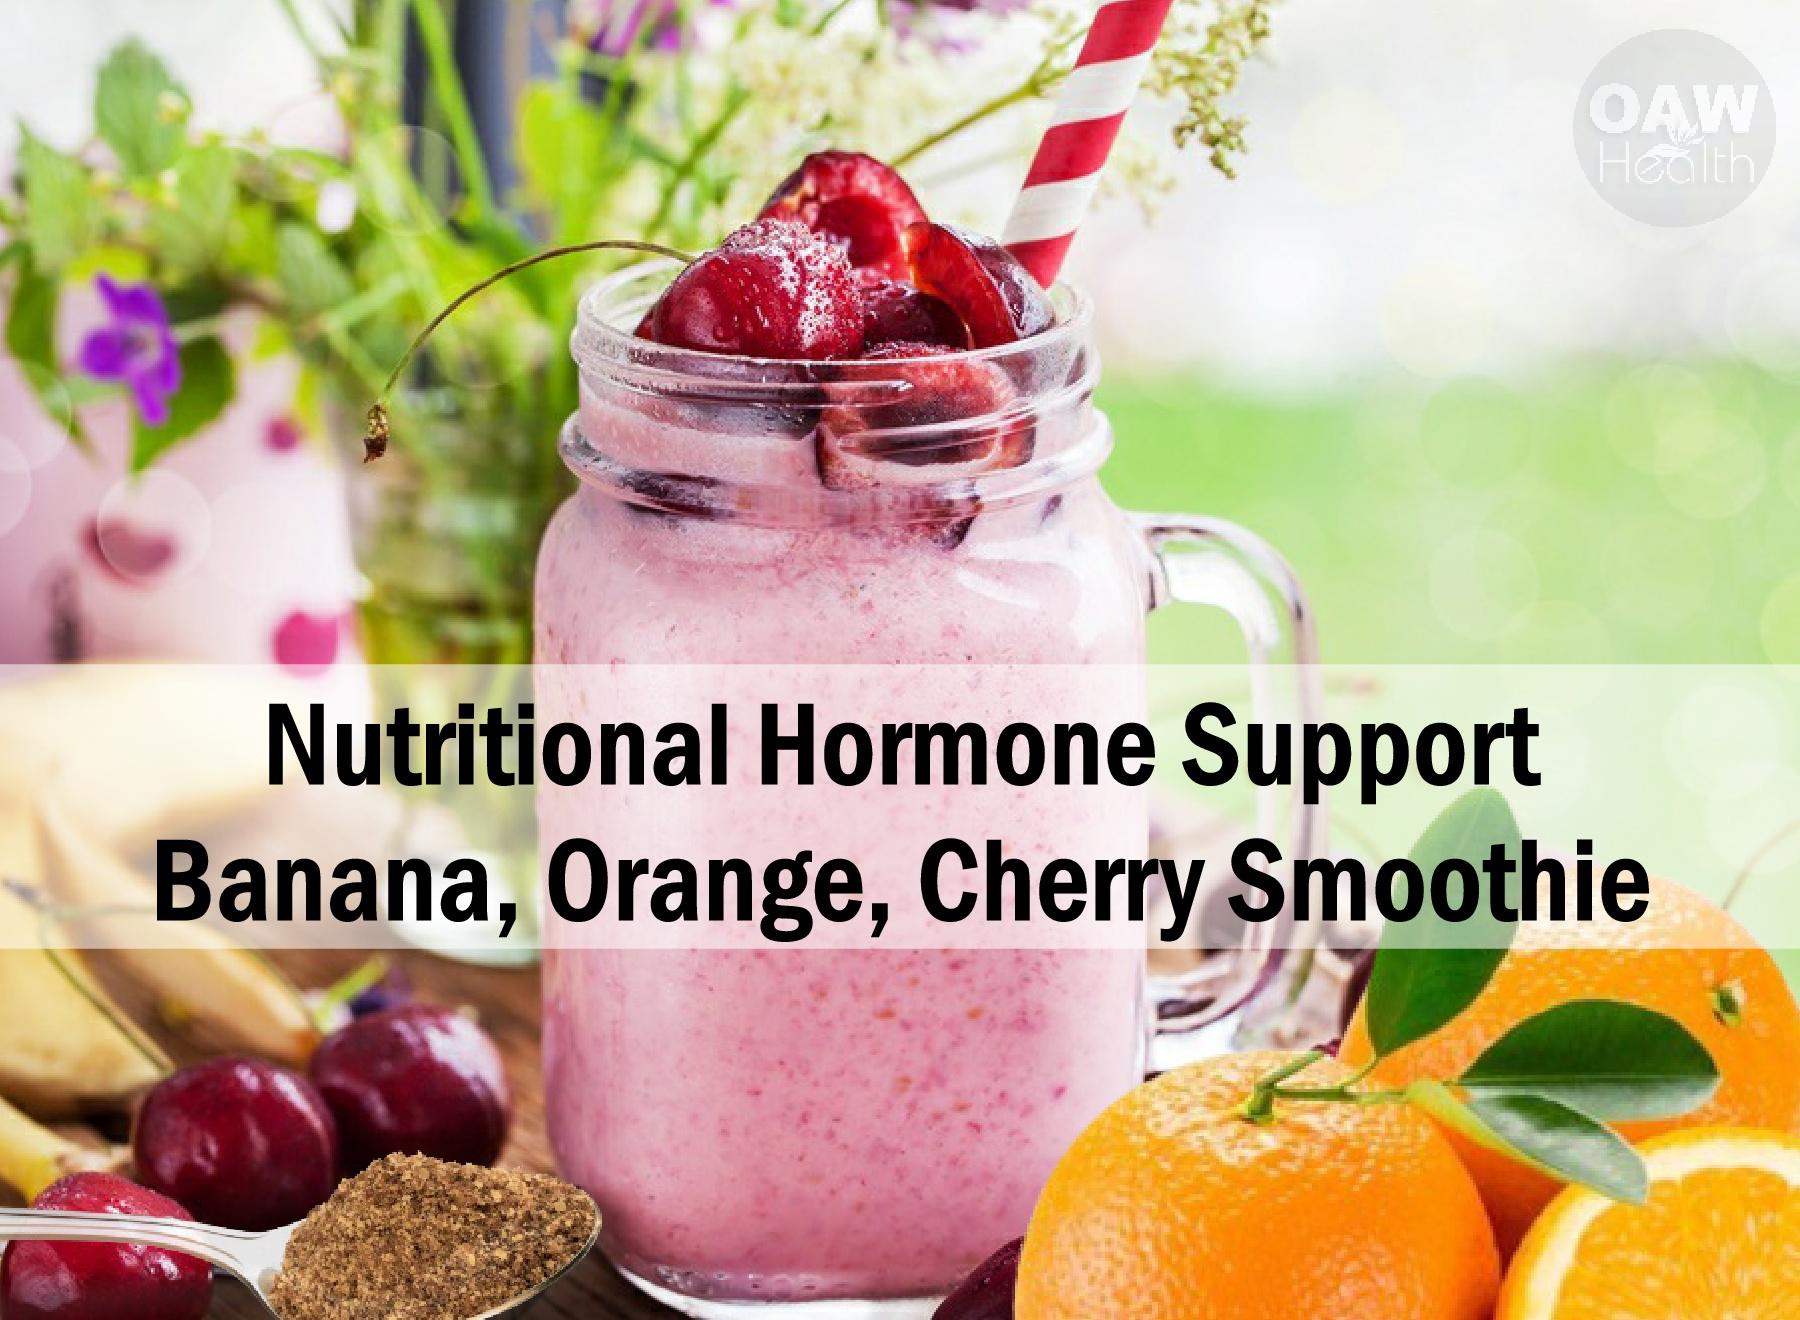 Nutritional Hormone Support: Banana, Orange, Cherry Smoothie